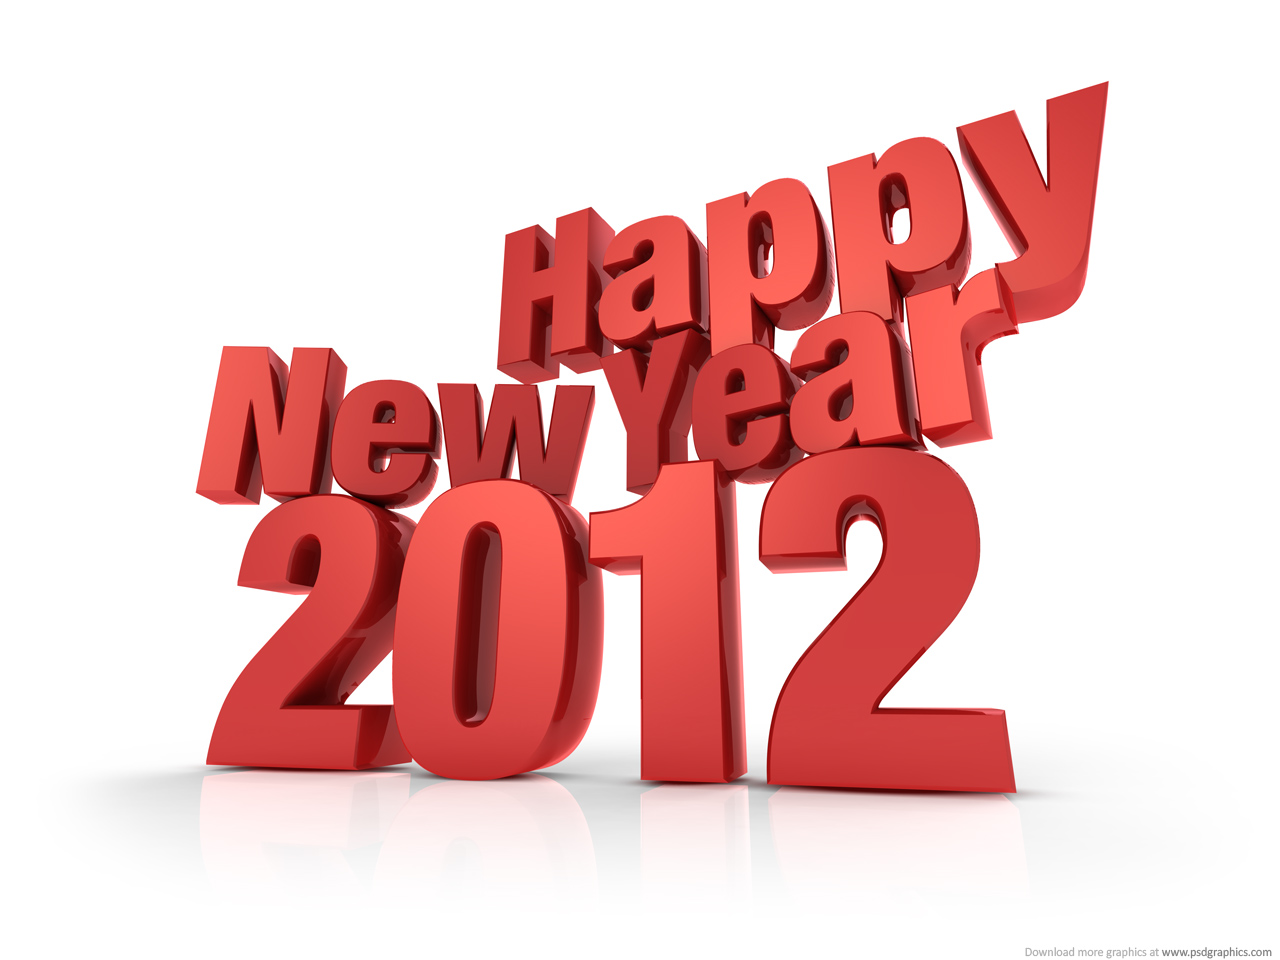 http://2.bp.blogspot.com/-ZW7XaNh9XbY/TsZBCZdlbvI/AAAAAAAADbM/gAX1maLGgPg/s1600/new-year-2012.jpg